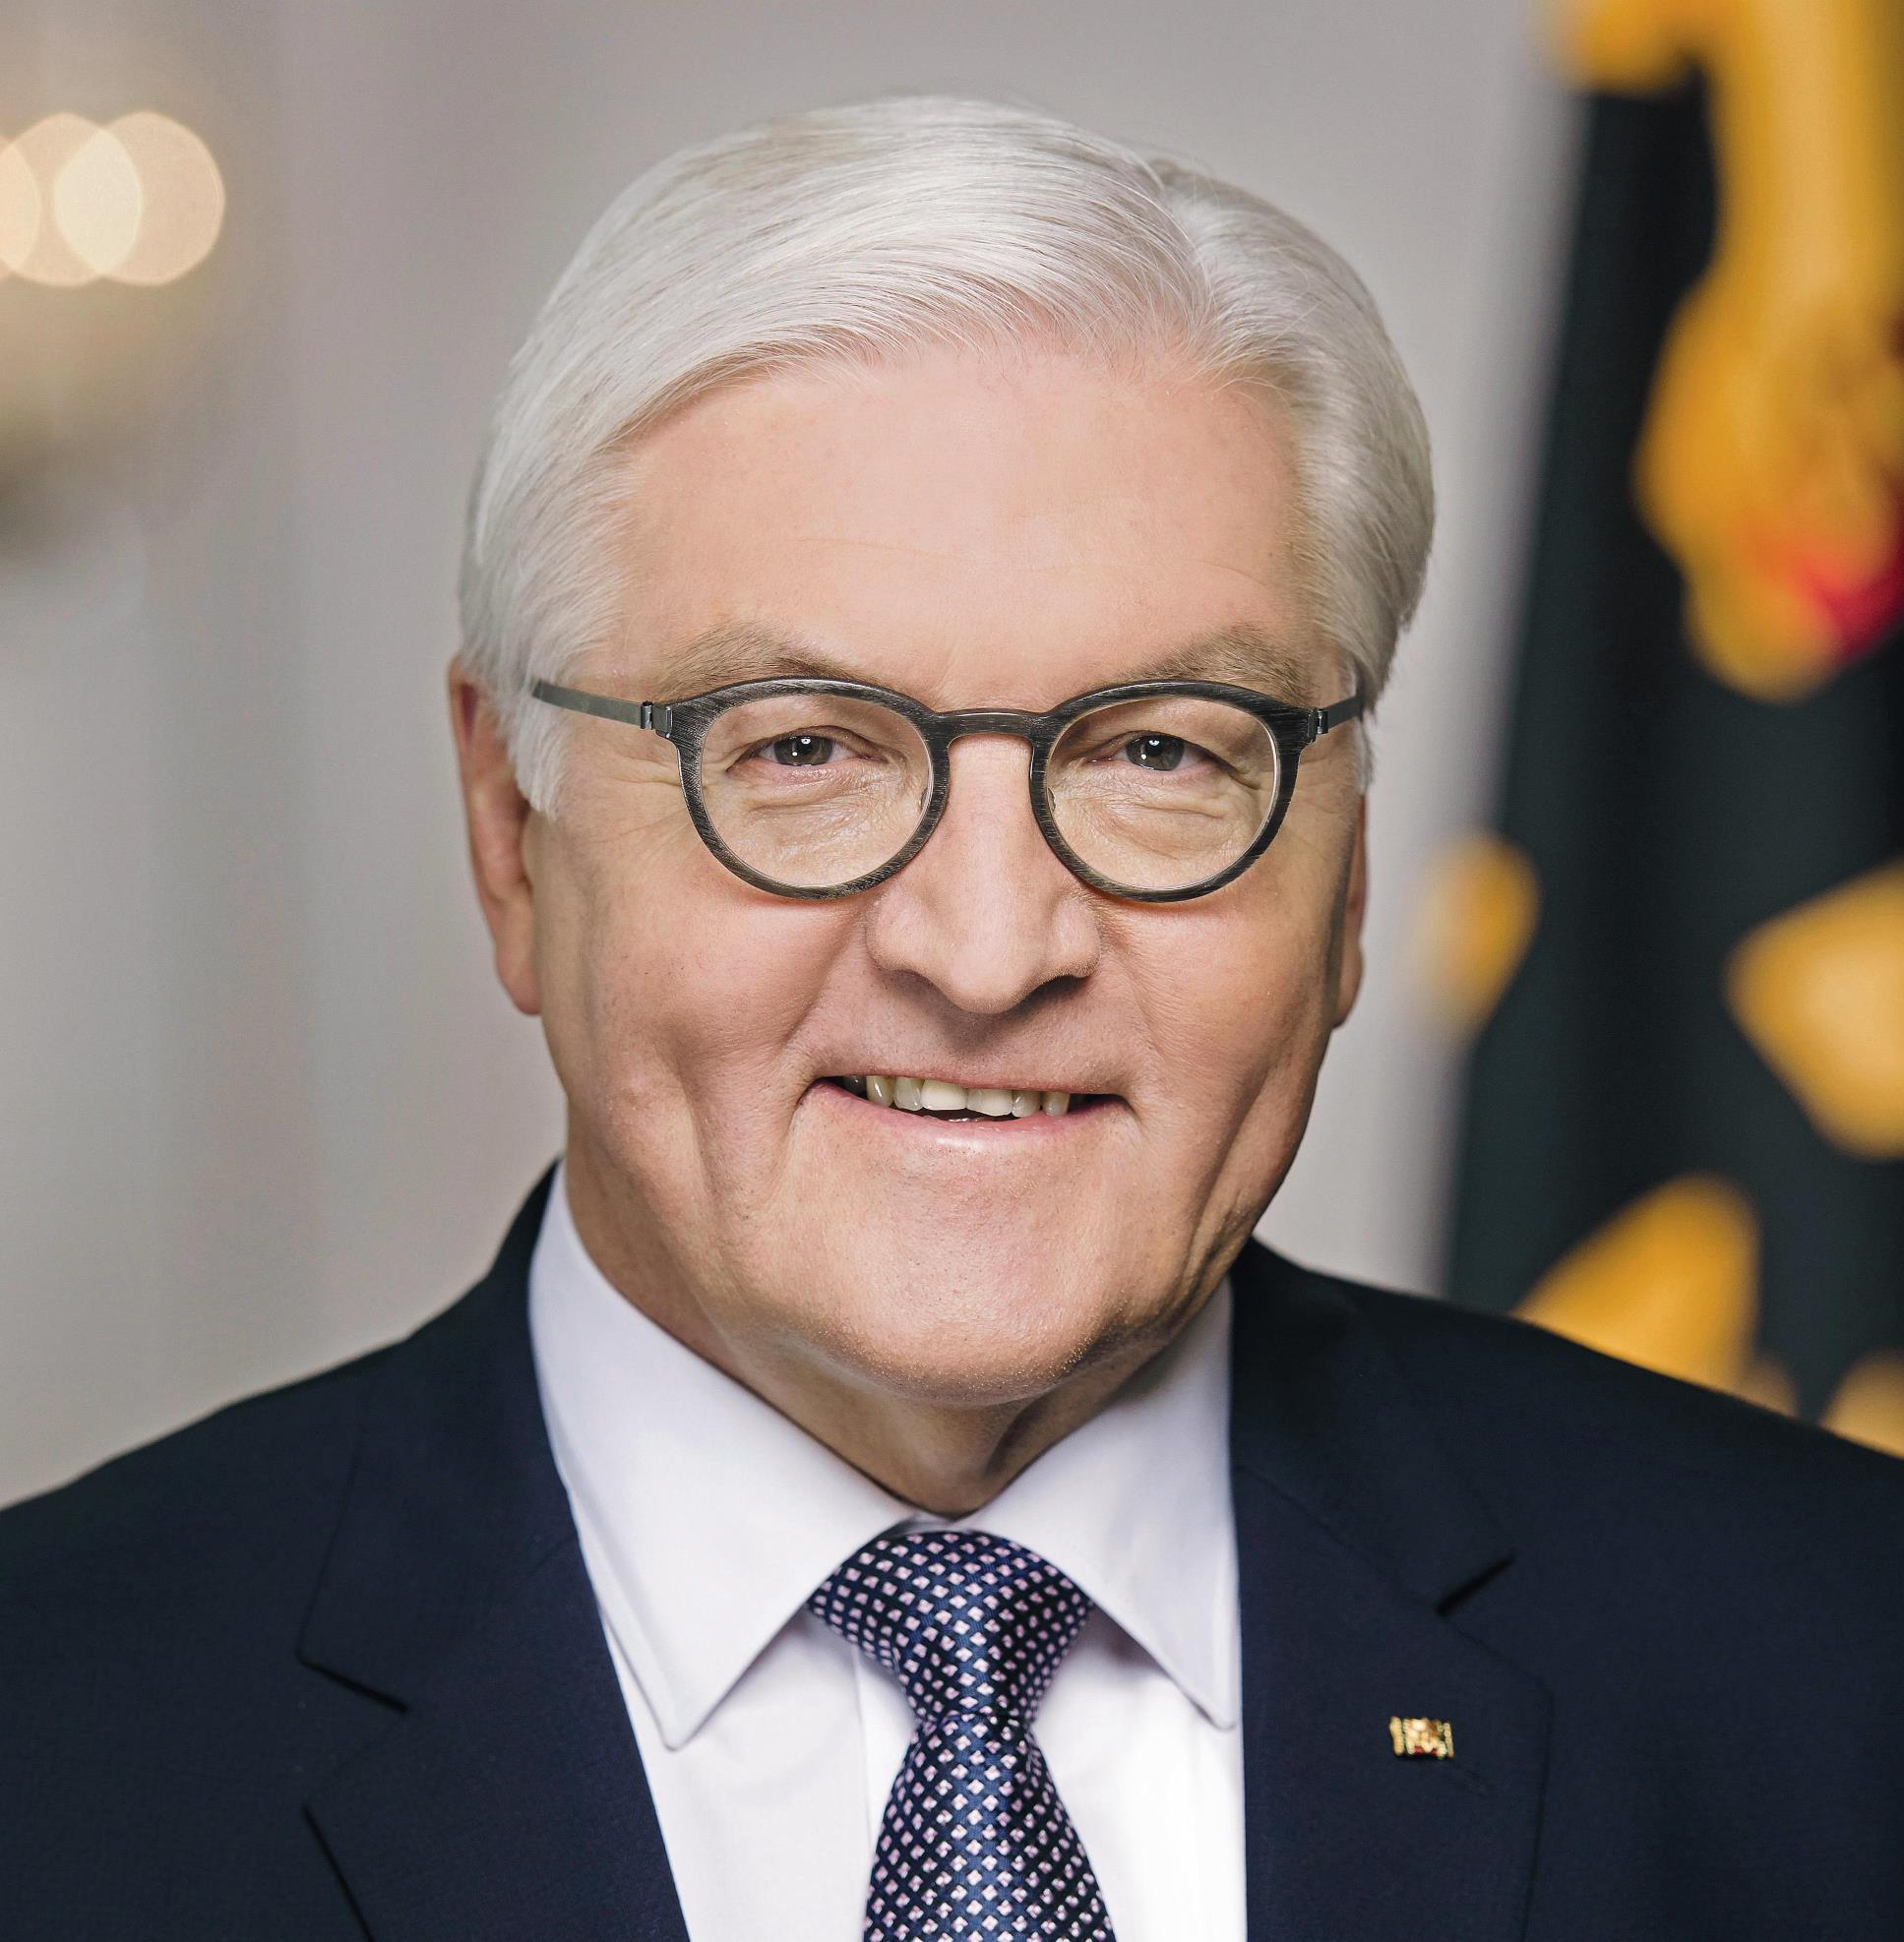 Steinmaier